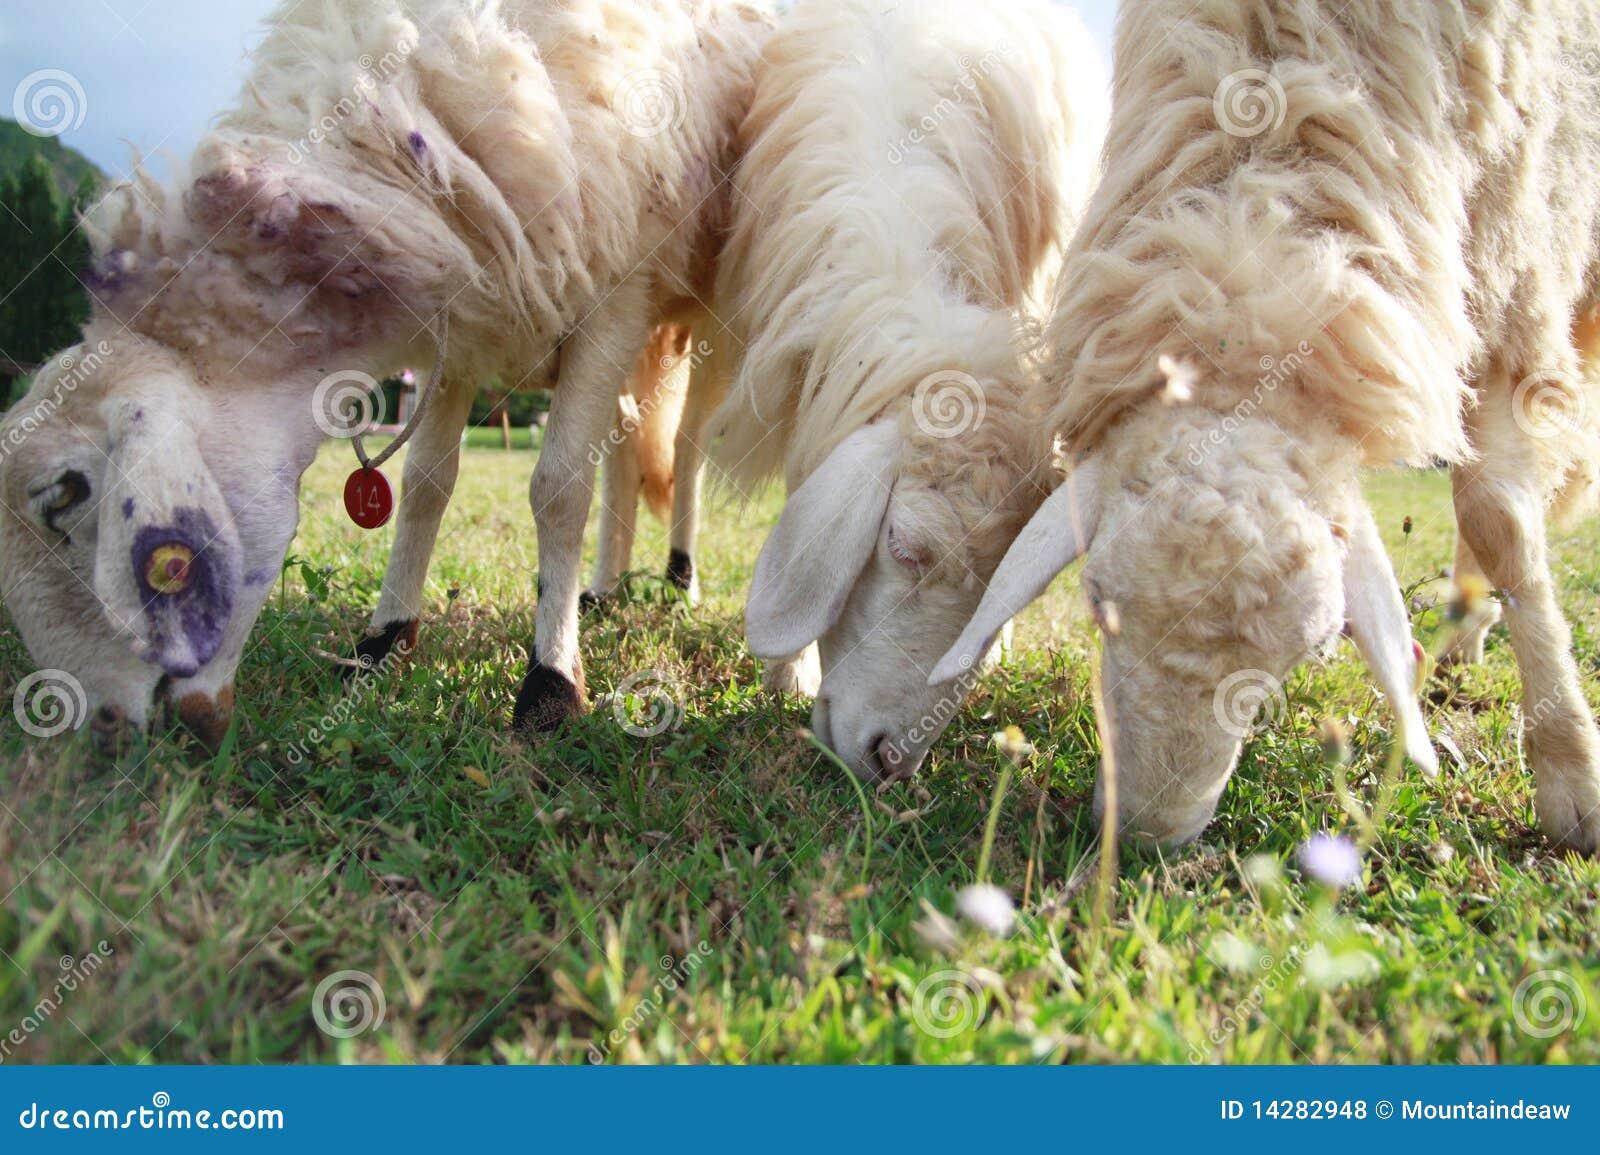 Three sheep - photo#22